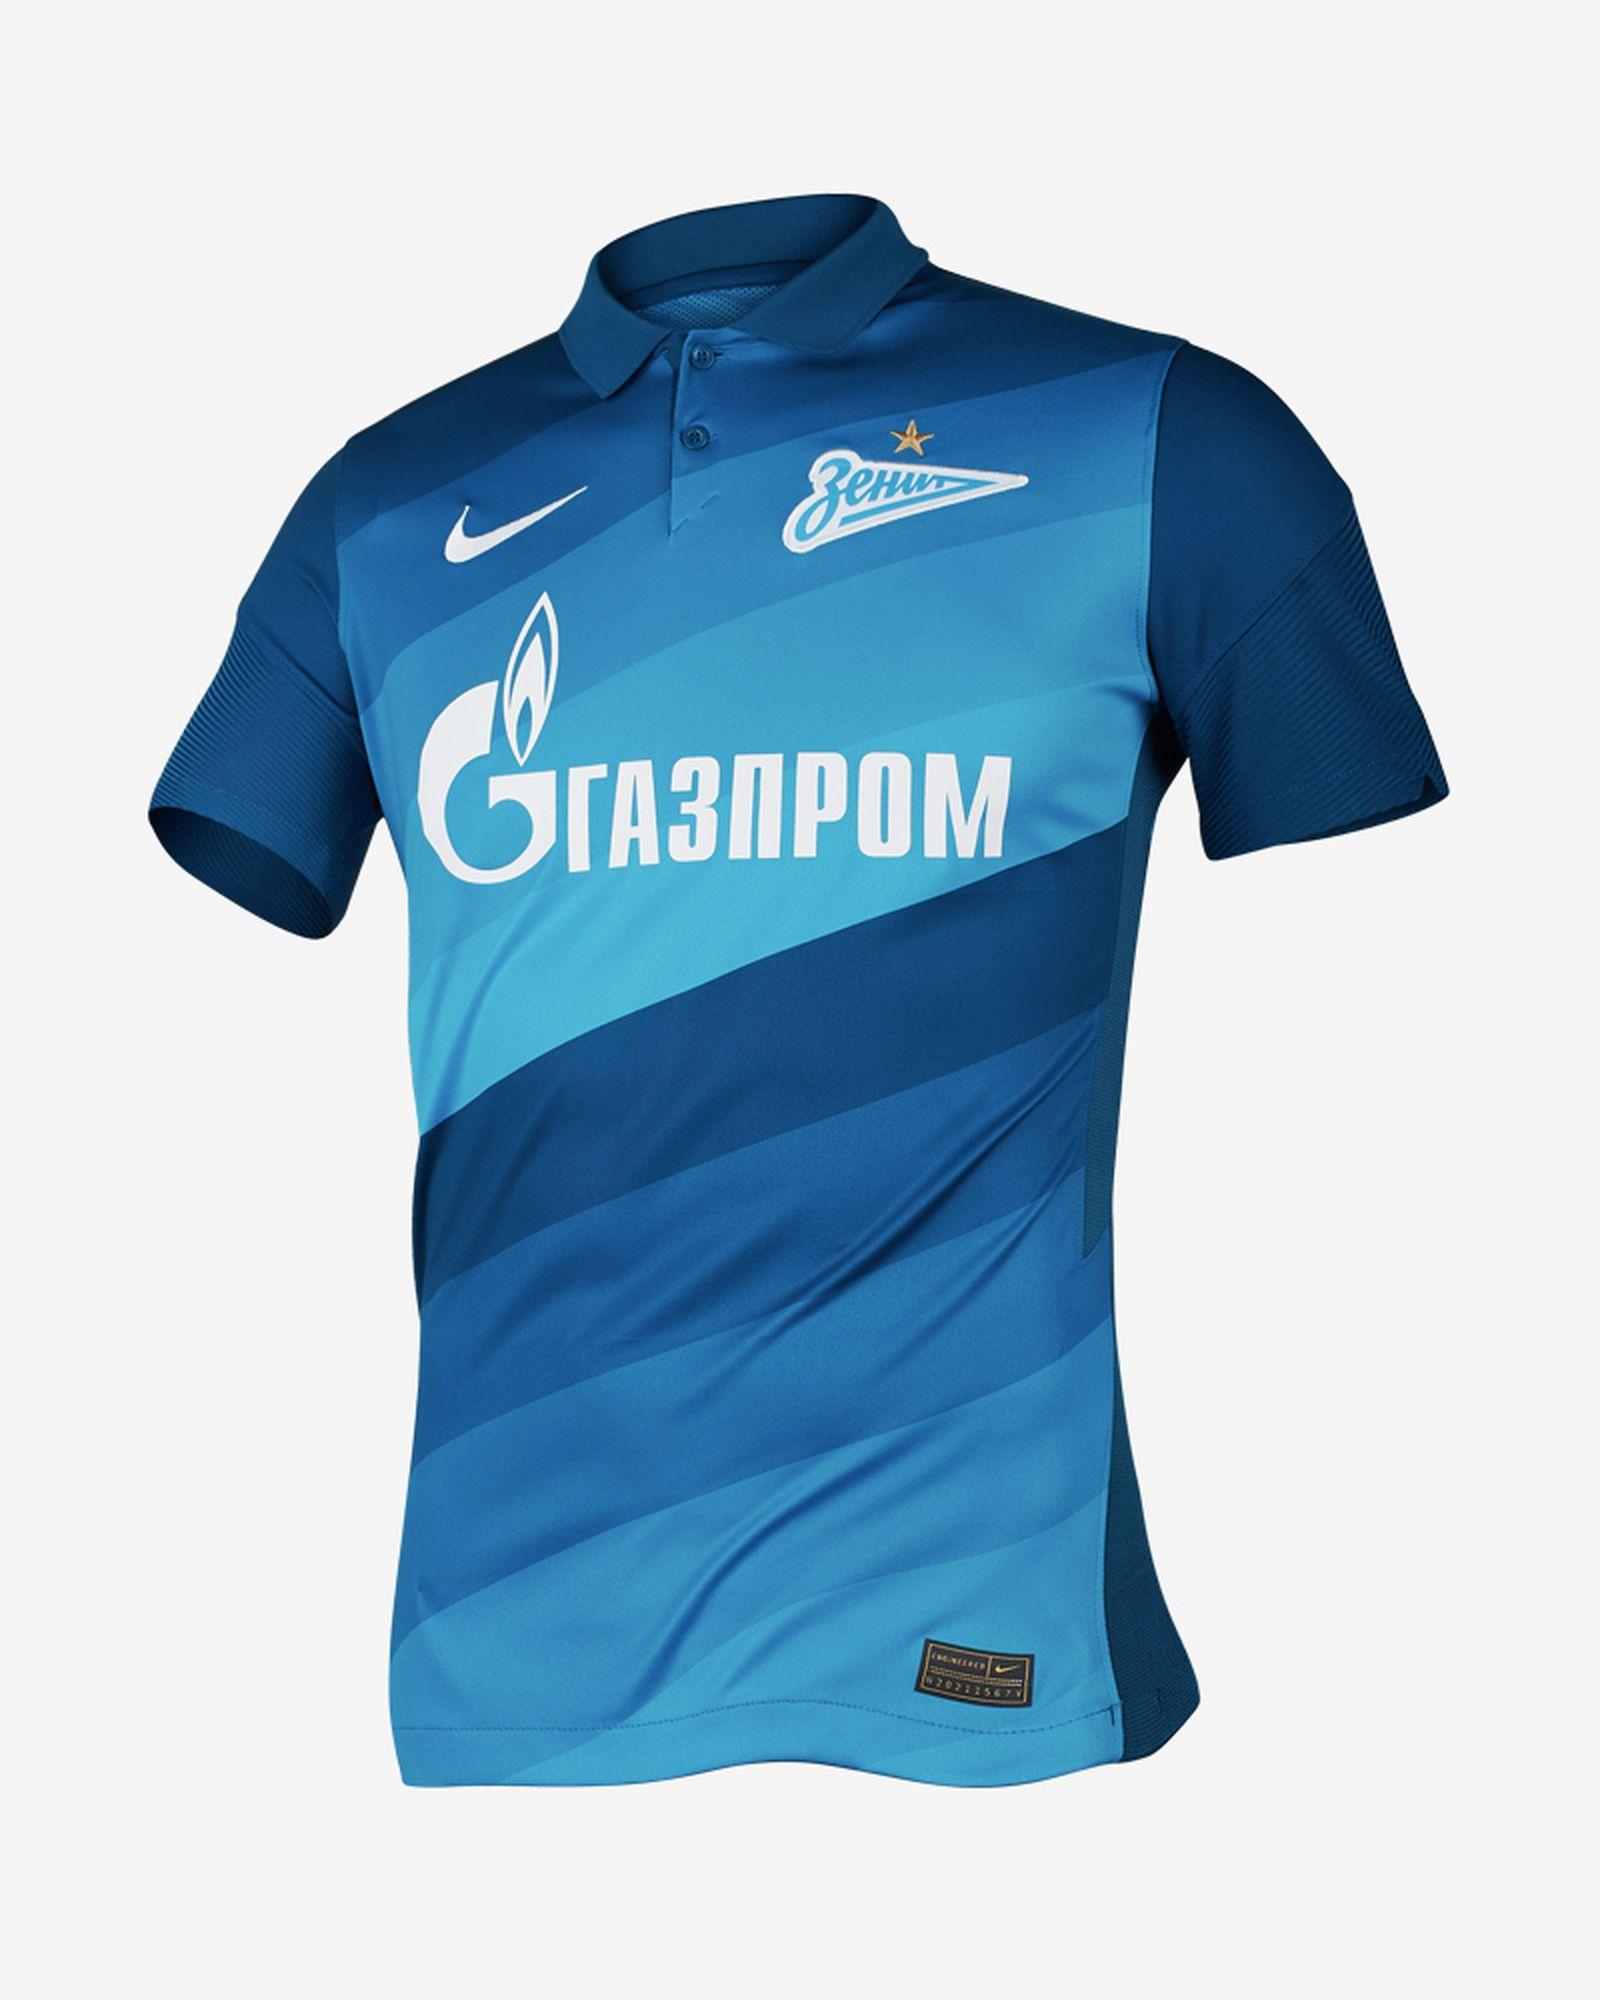 football-shirts-2020-review-16